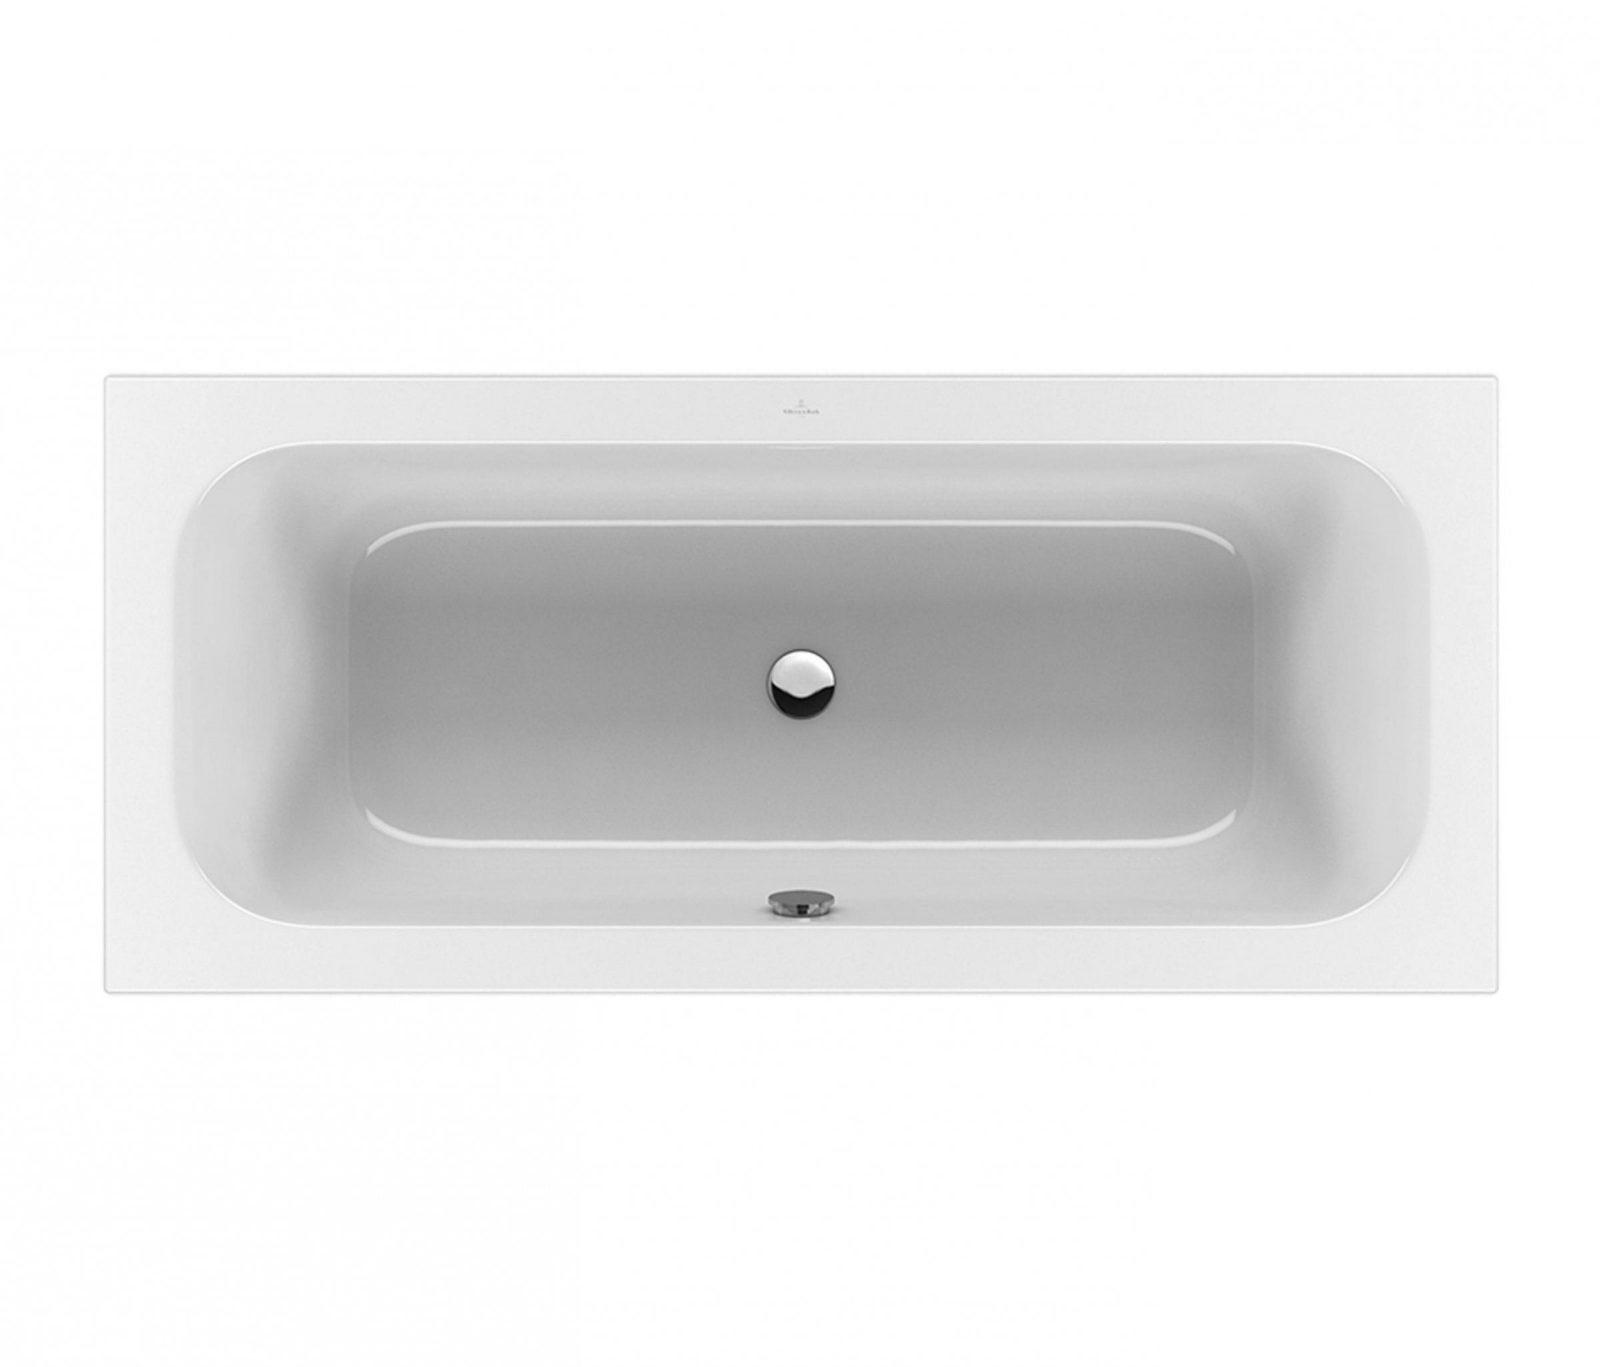 Loop&friends Bath  Builtin Bathtubs From Villeroy & Boch  Architonic von Loop & Friends Badewanne Photo